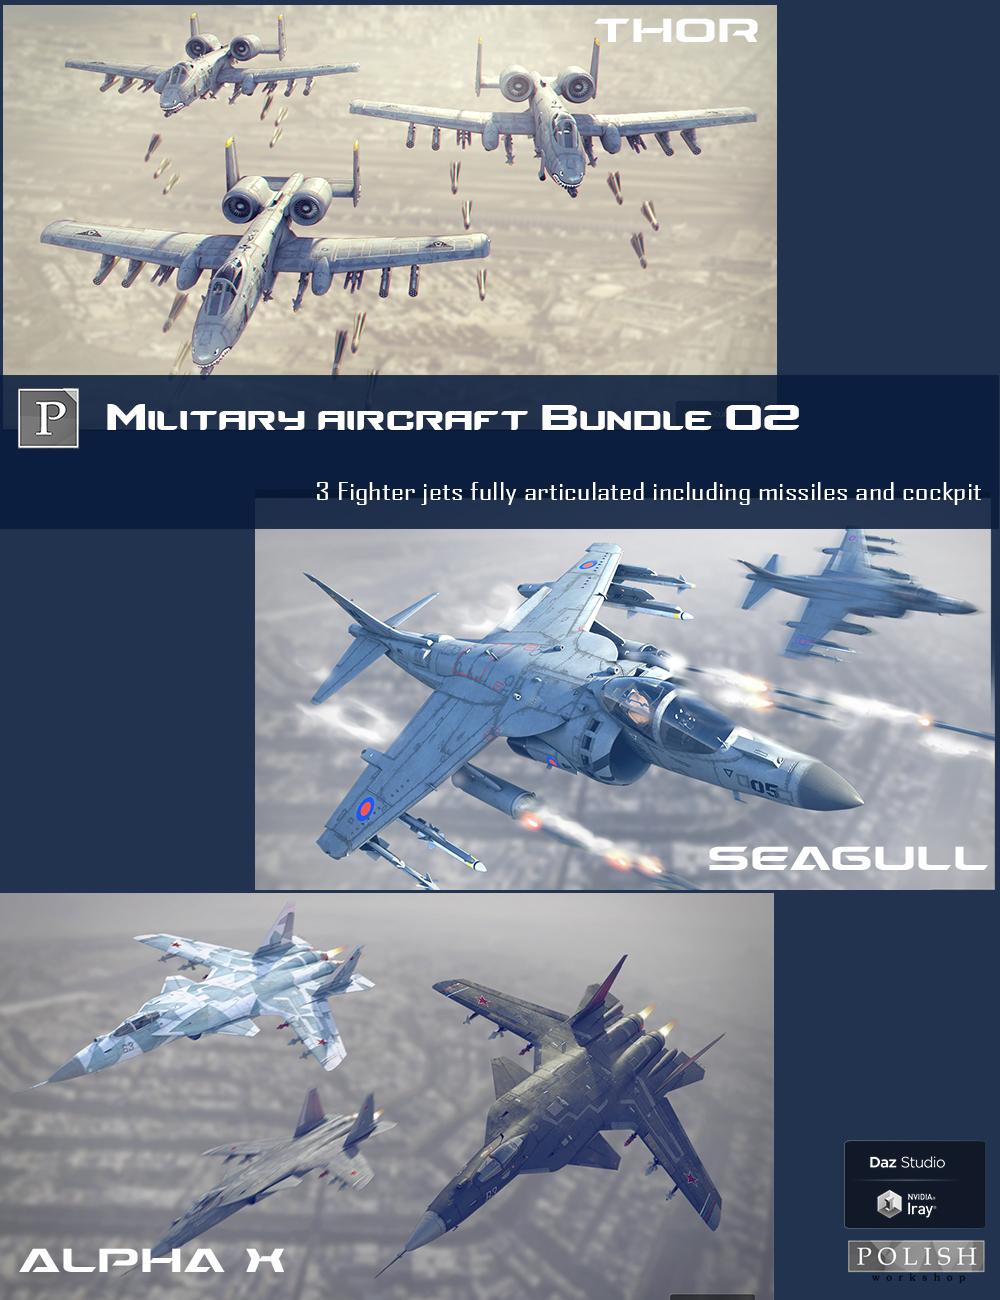 Military Aircraft Bundle 02 by: Polish, 3D Models by Daz 3D